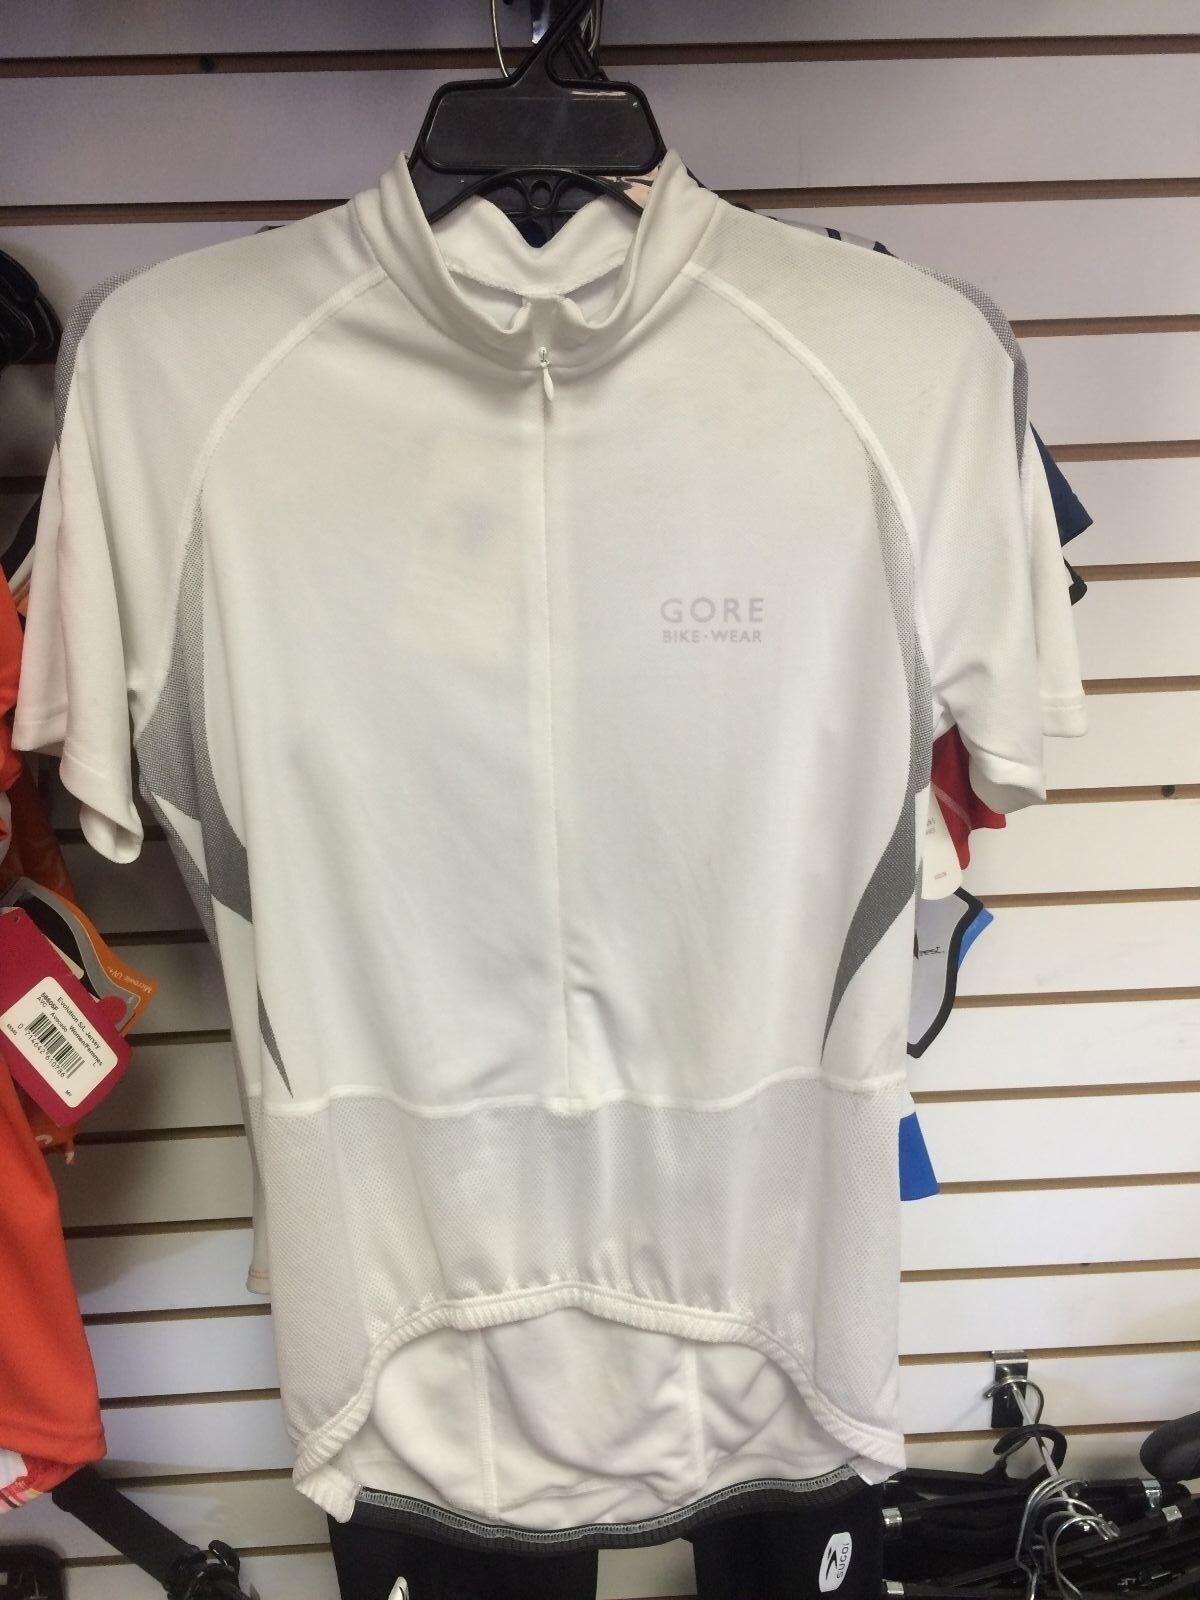 Gore Xenon Tricot White XL